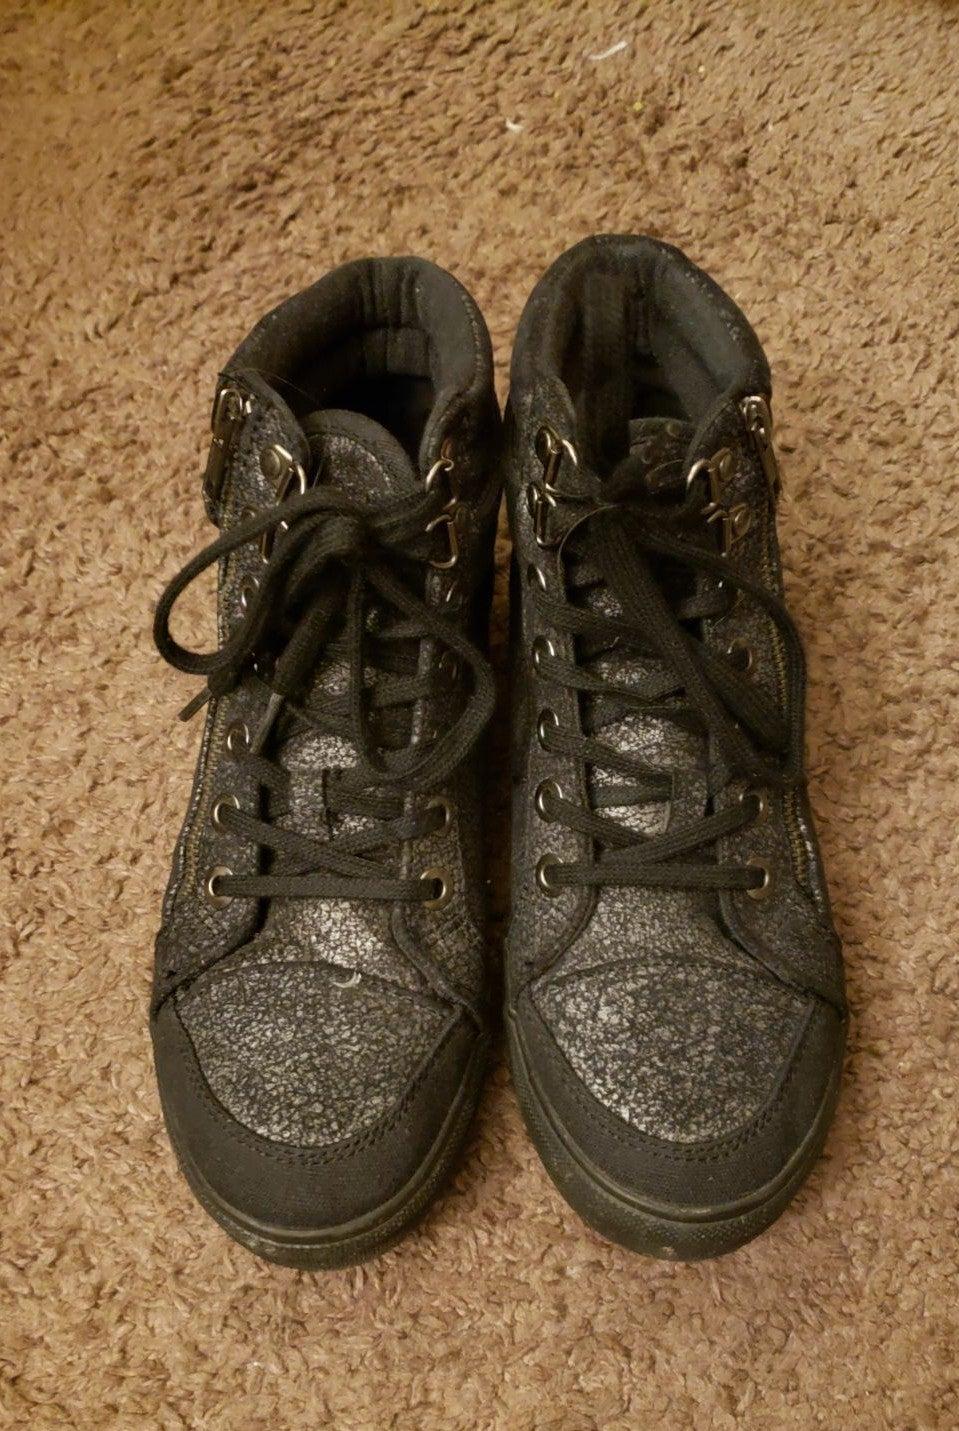 Us polo assn high top shoes size 7